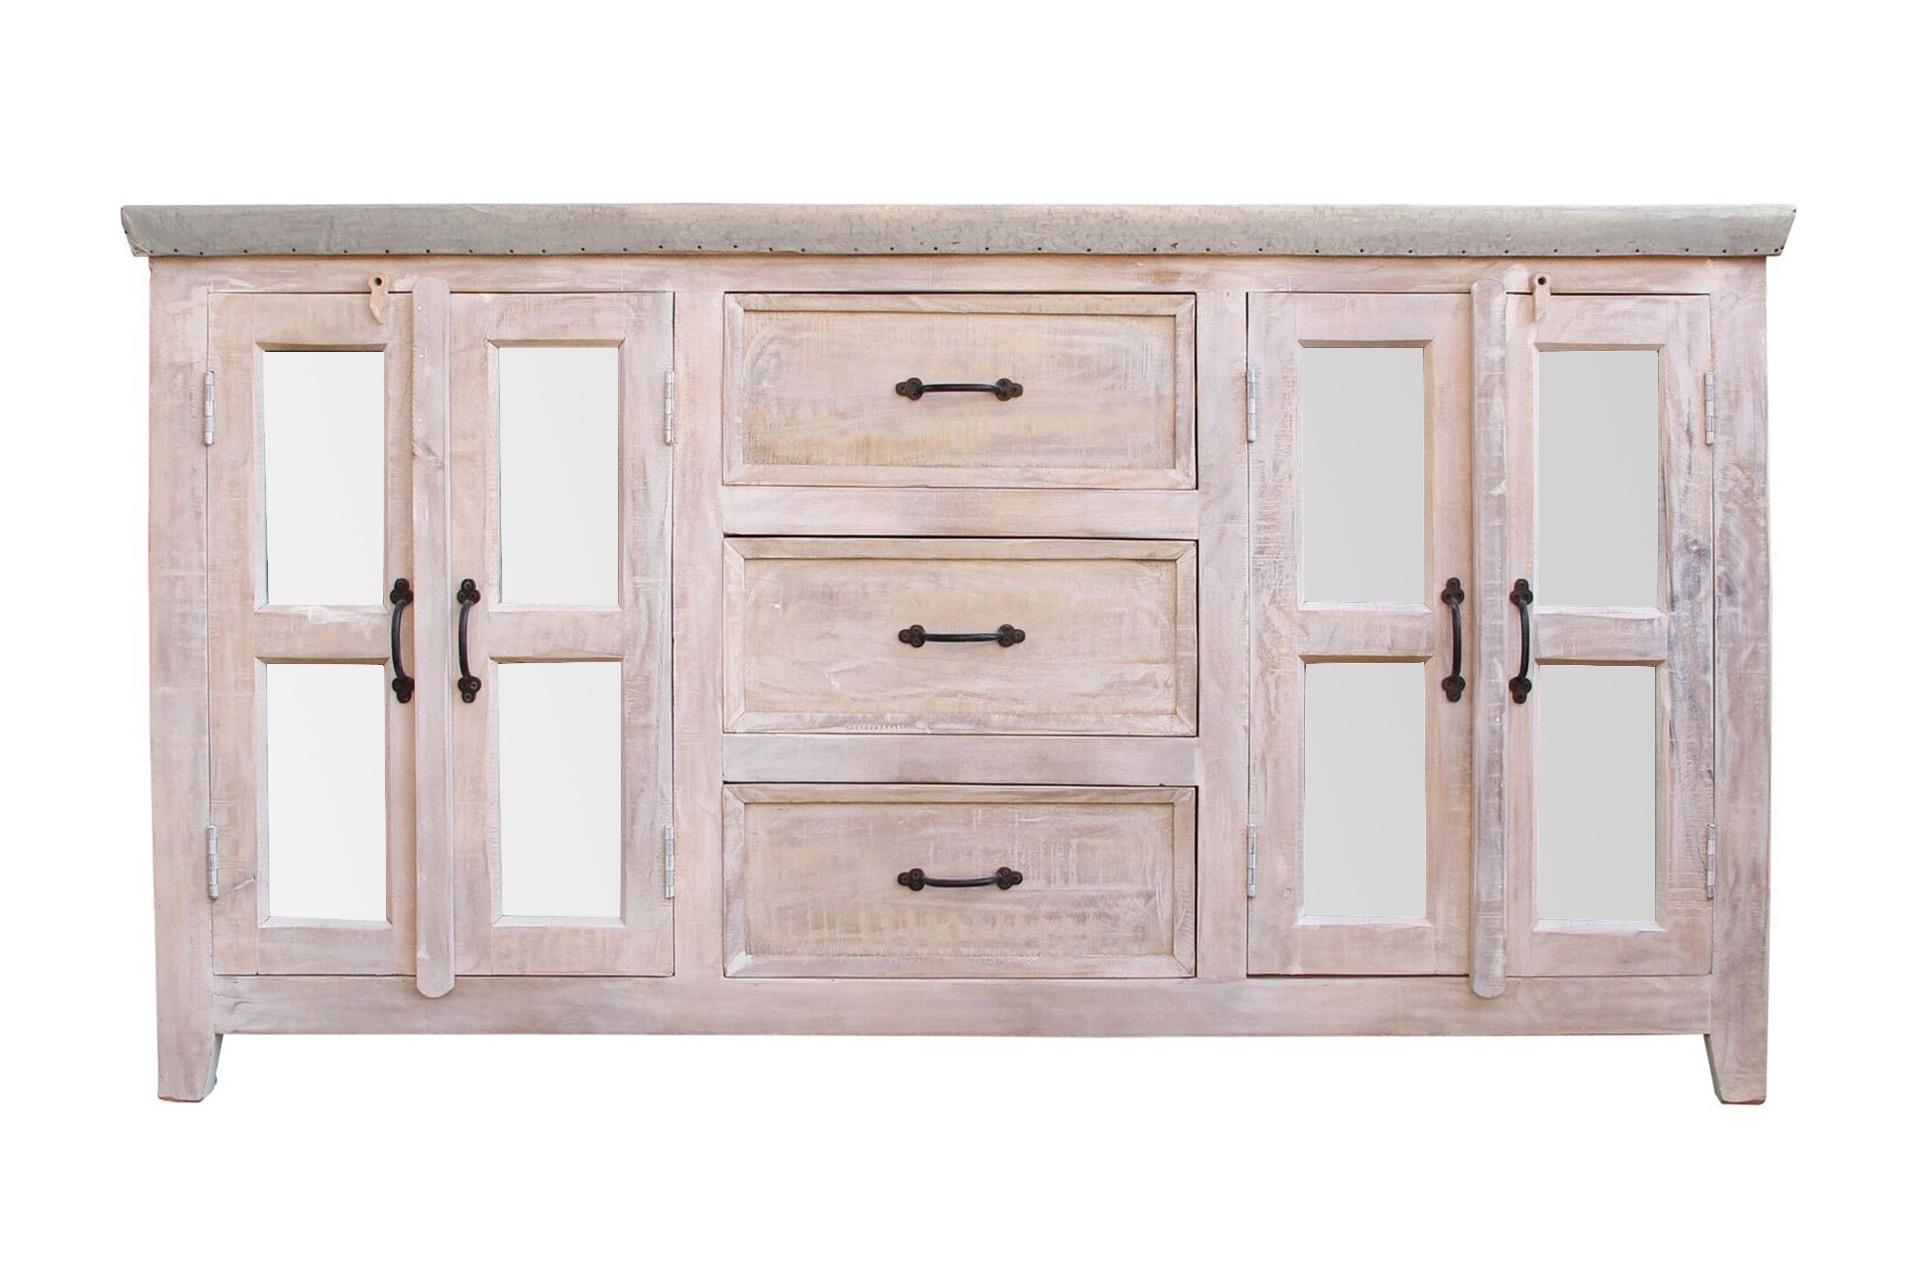 White Wash 4-Door/3-Drawer Glass Sideboard intended for White Wash 3-Door 3-Drawer Sideboards (Image 29 of 30)